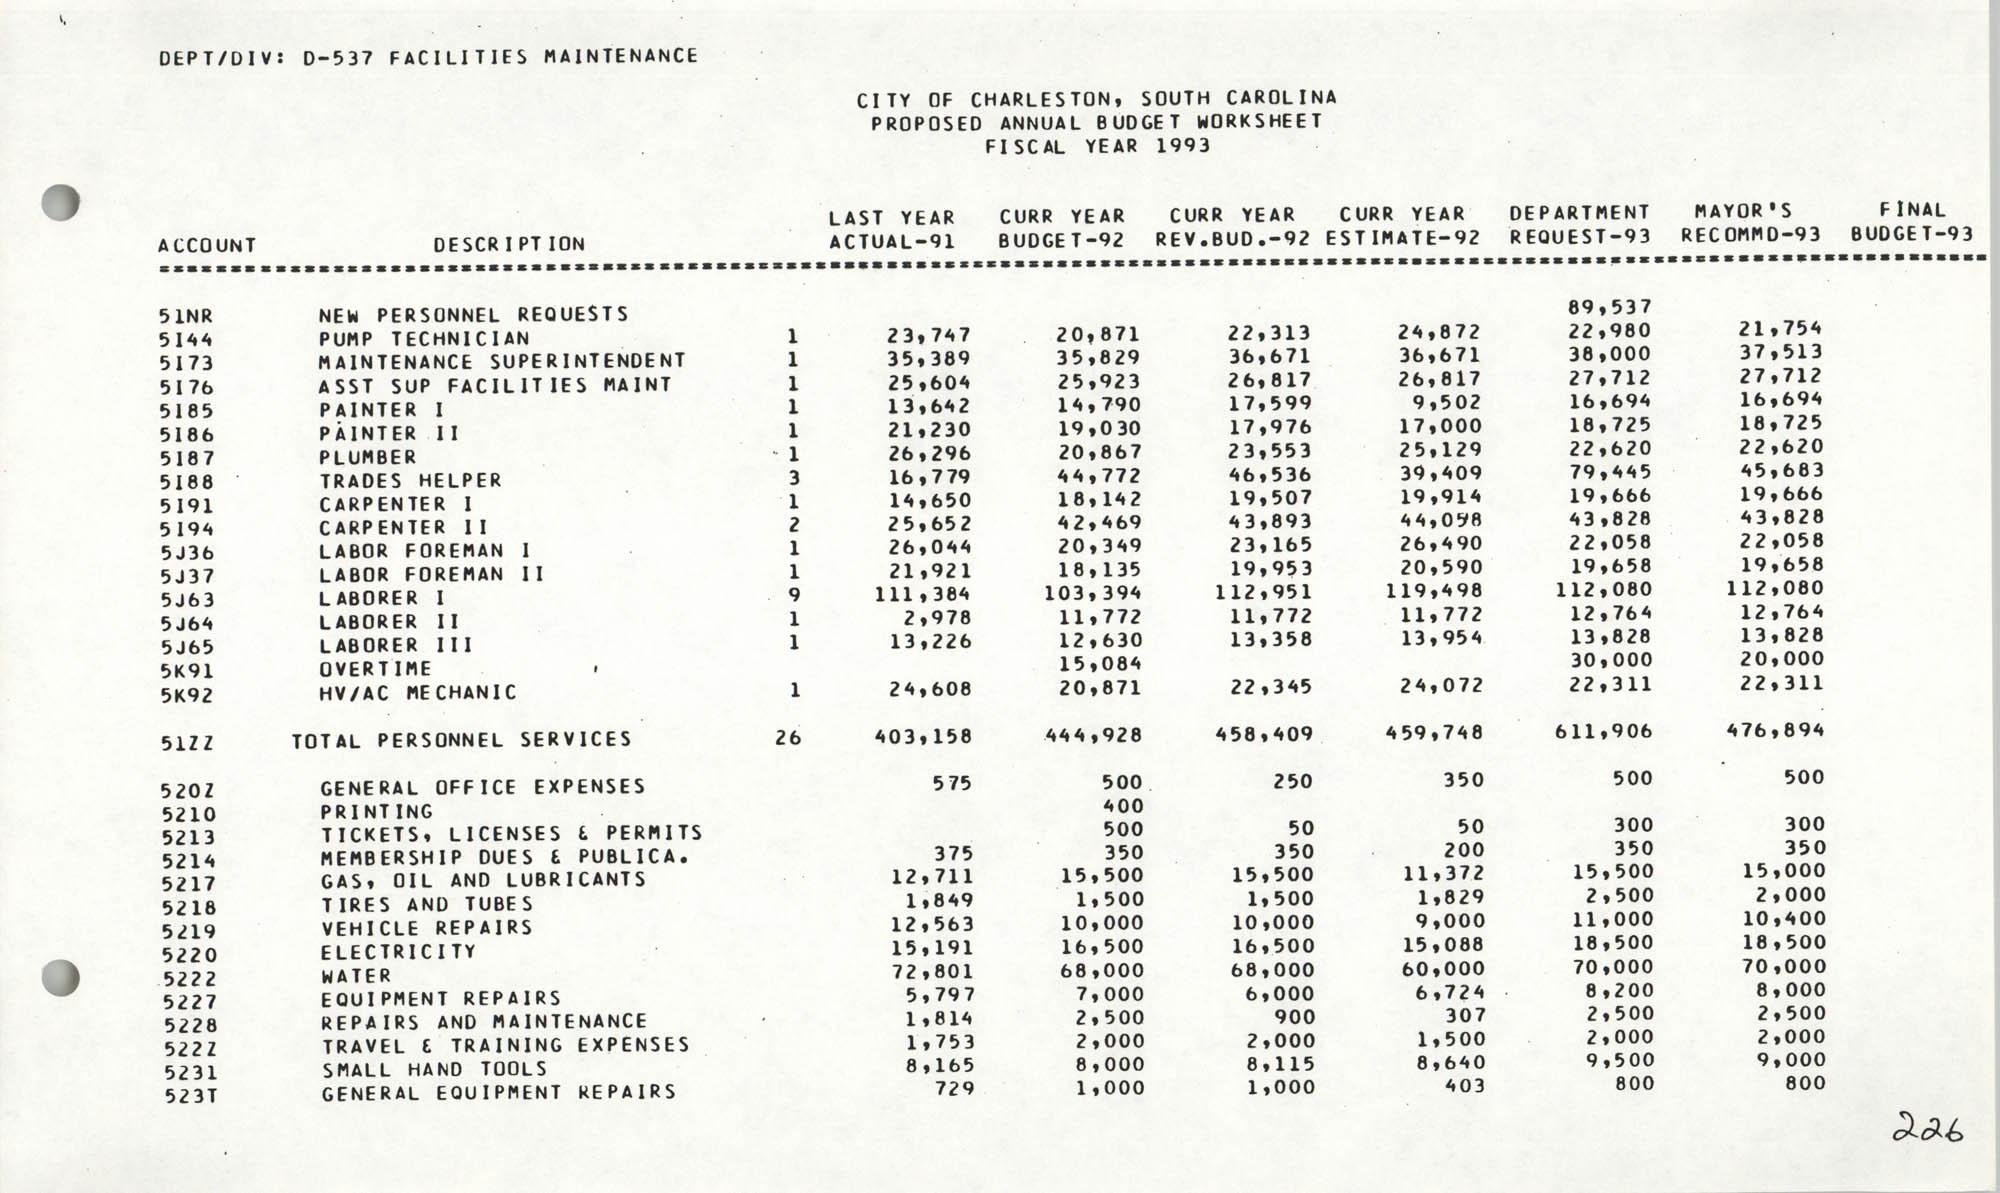 The City Council of Charleston, South Carolina, 1993 Budget, Page 226